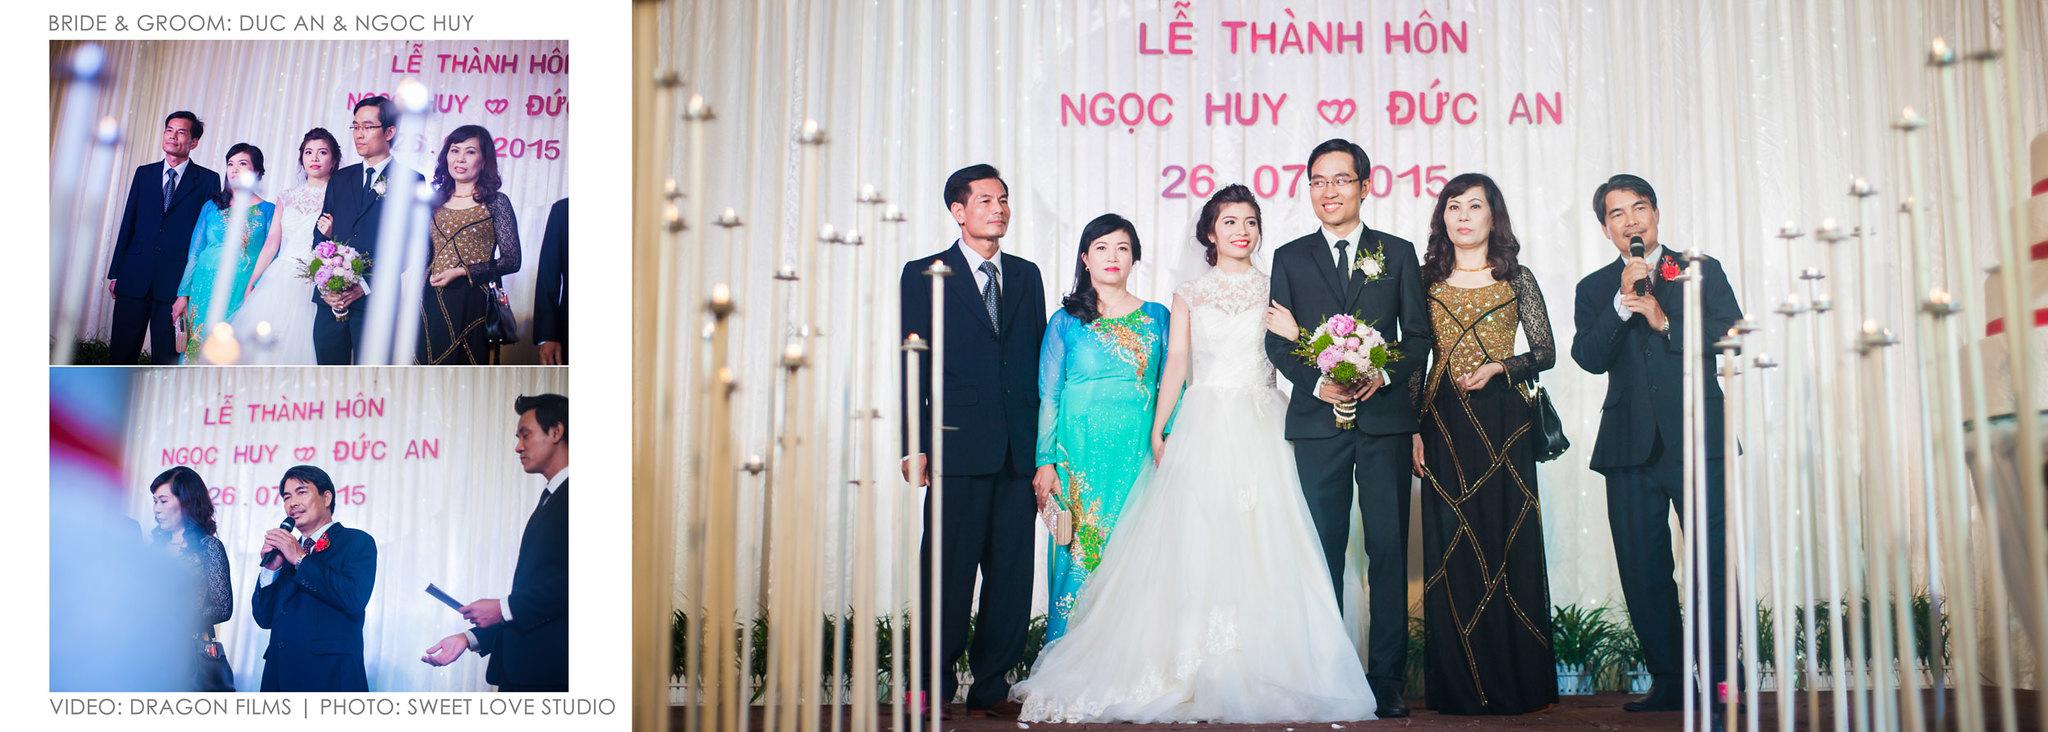 Chup-anh-cuoi-phong-su-Duc-An-Ngoc-Huy-56